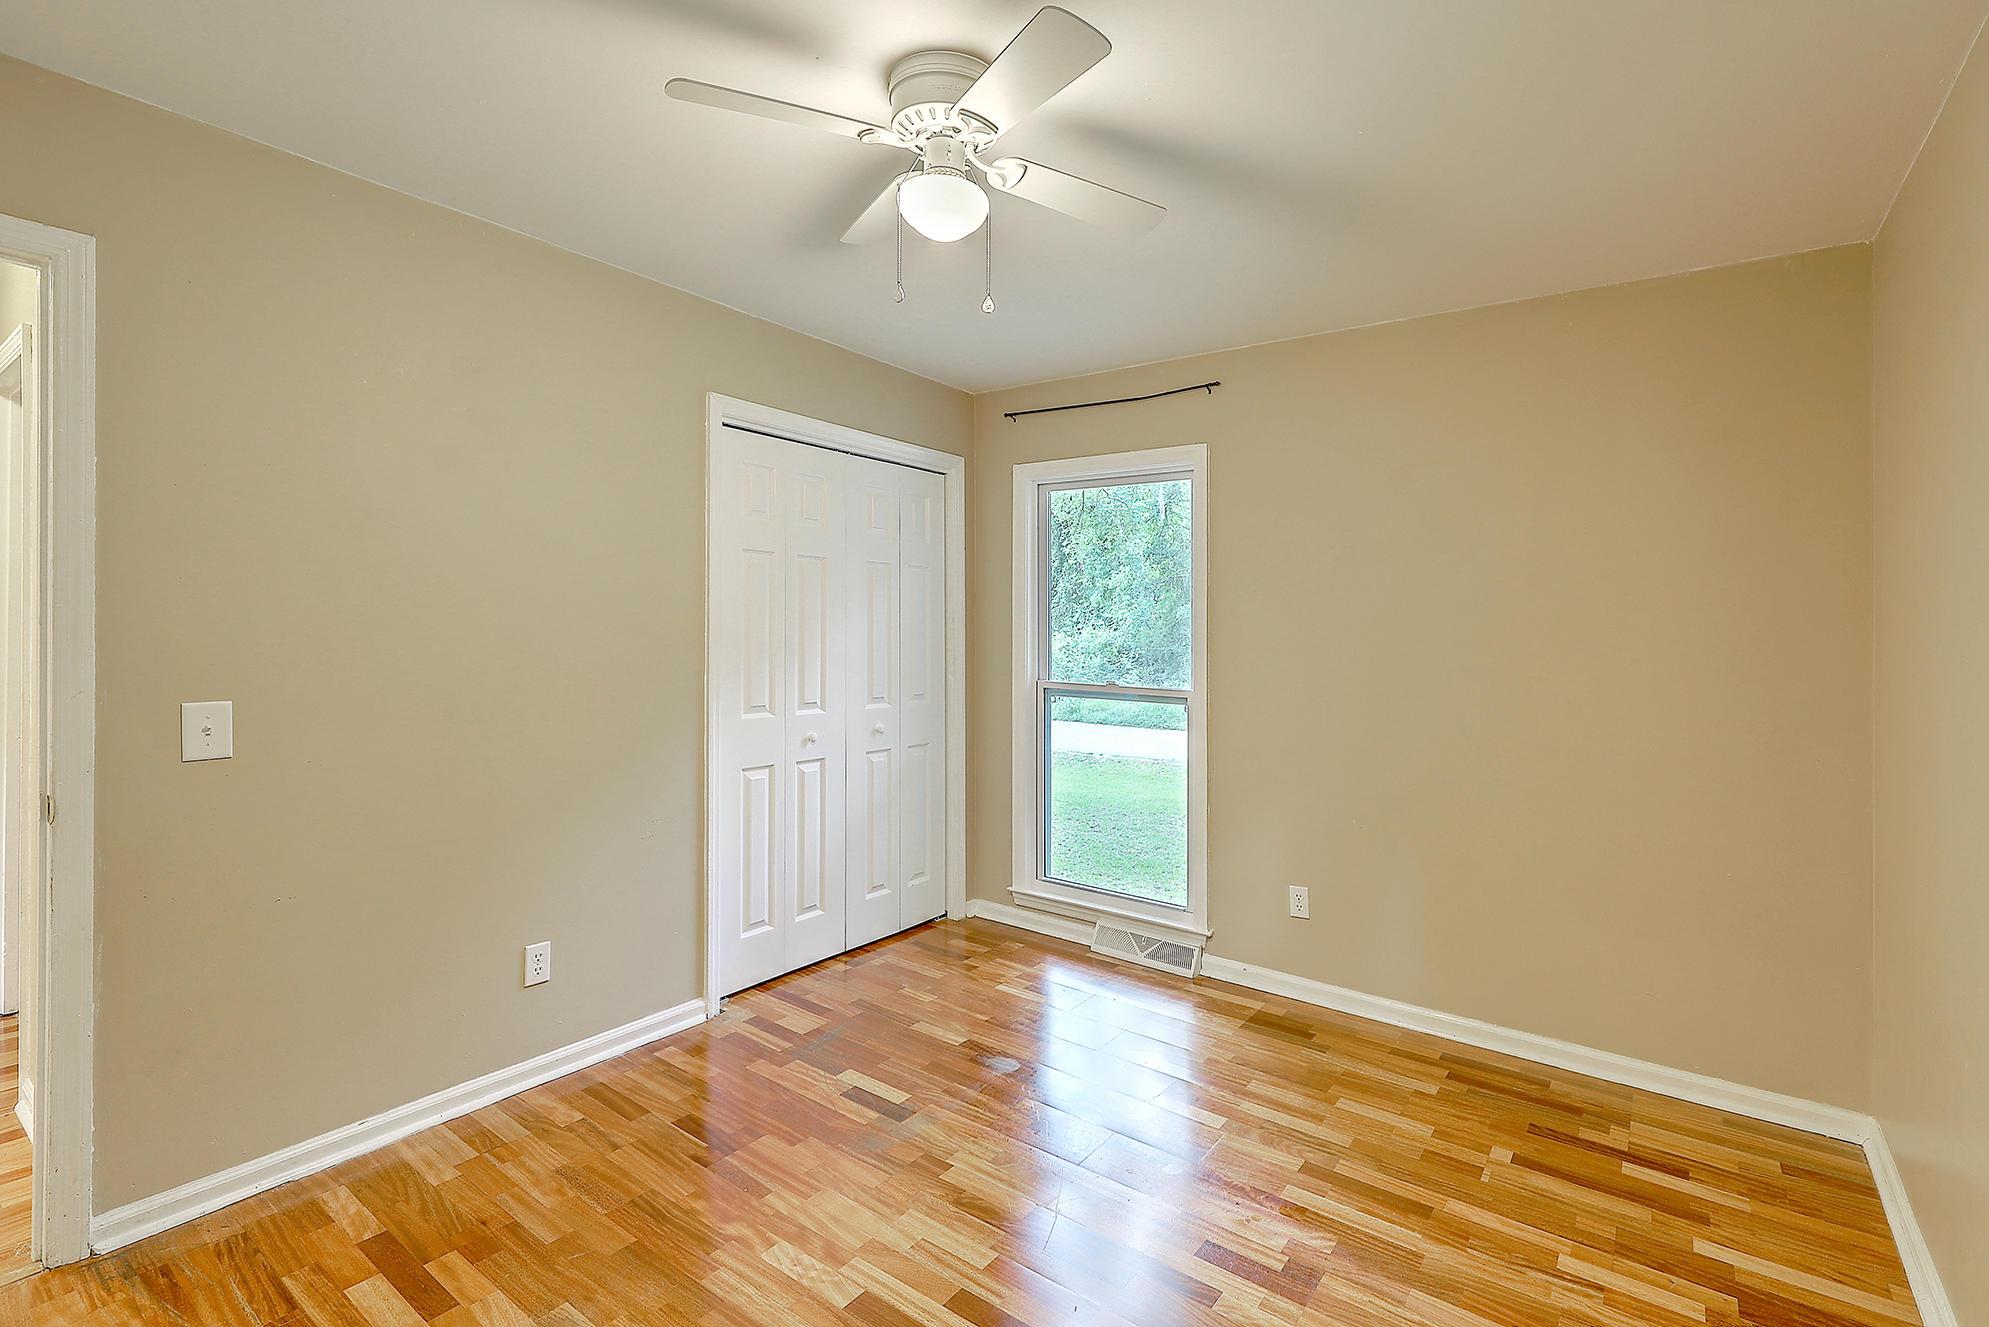 Oakland Homes For Sale - 344 Shore, Charleston, SC - 23